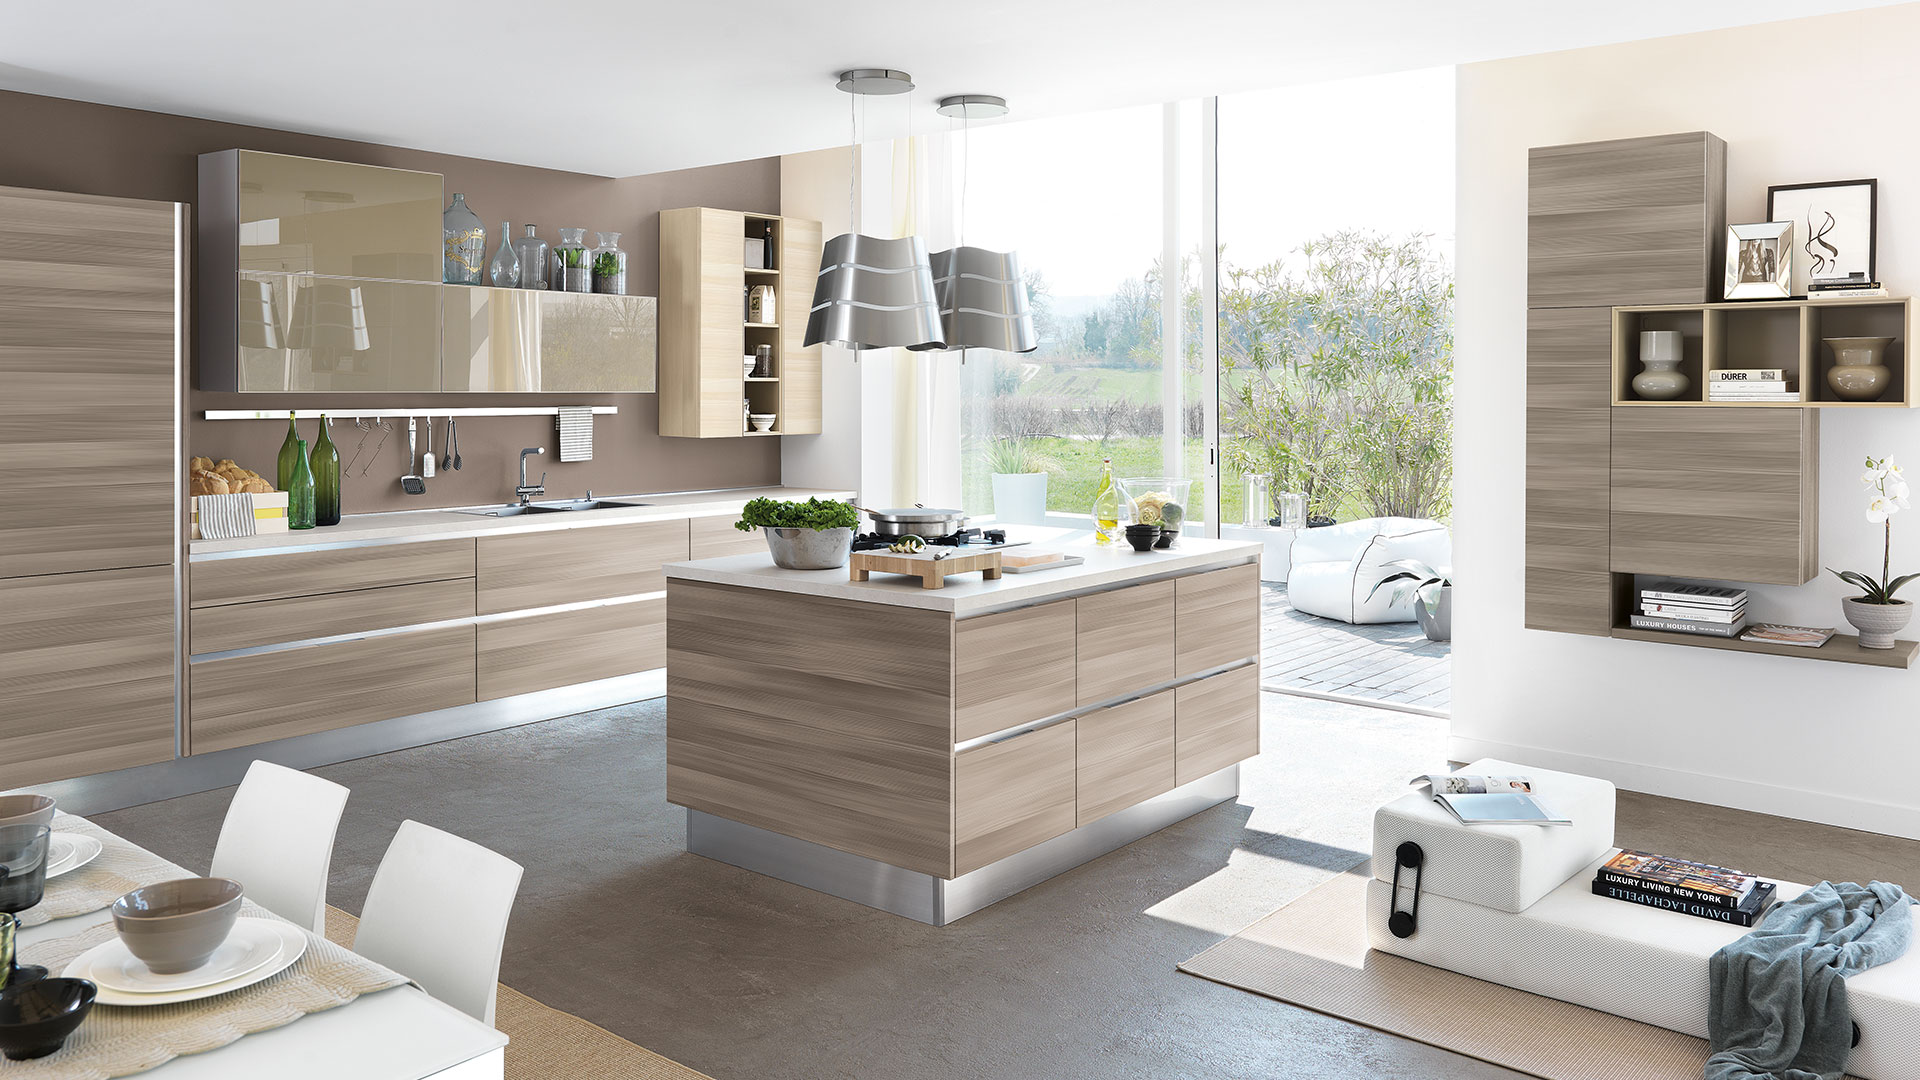 Essenza Cucine Moderne Scheda Prodotto Cucine Lube